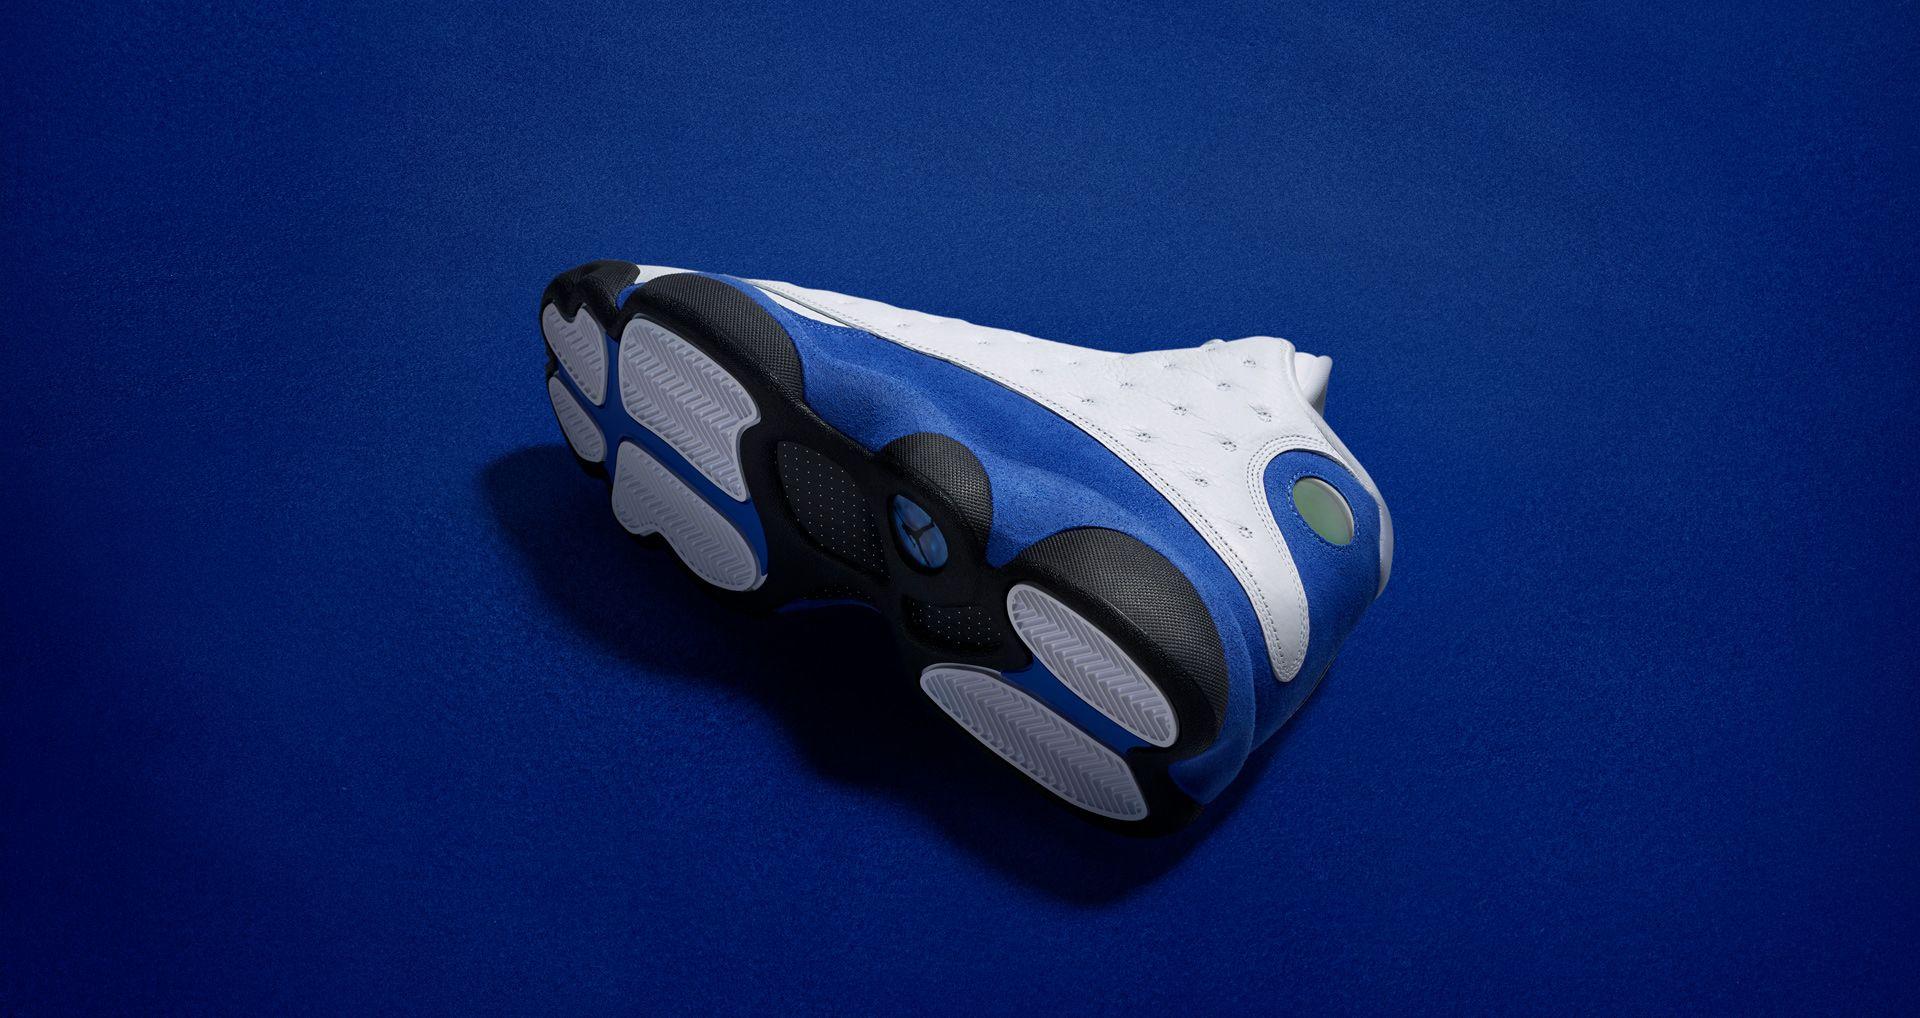 new product 76354 a2b40 Air Jordan 13 'White & Hyper Royal' Release Date. Nike+ SNKRS